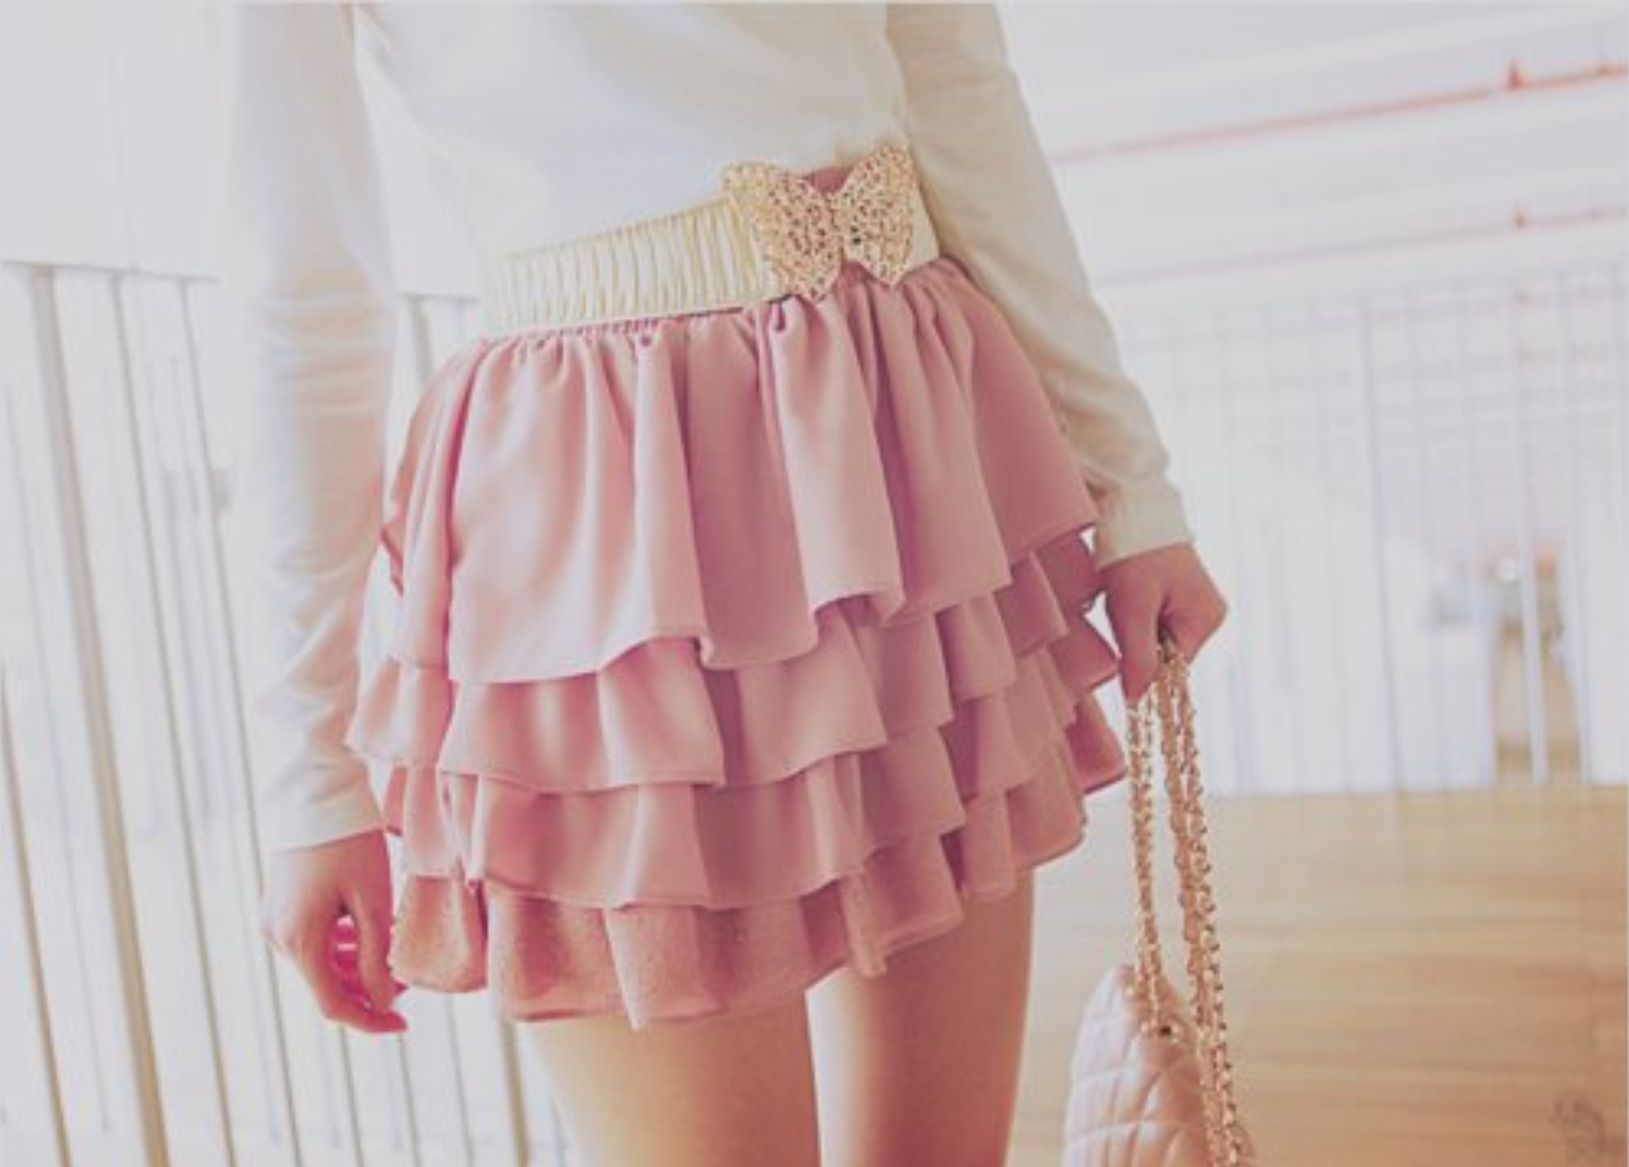 Розовая мини юбка на девушке фото 10 фотография